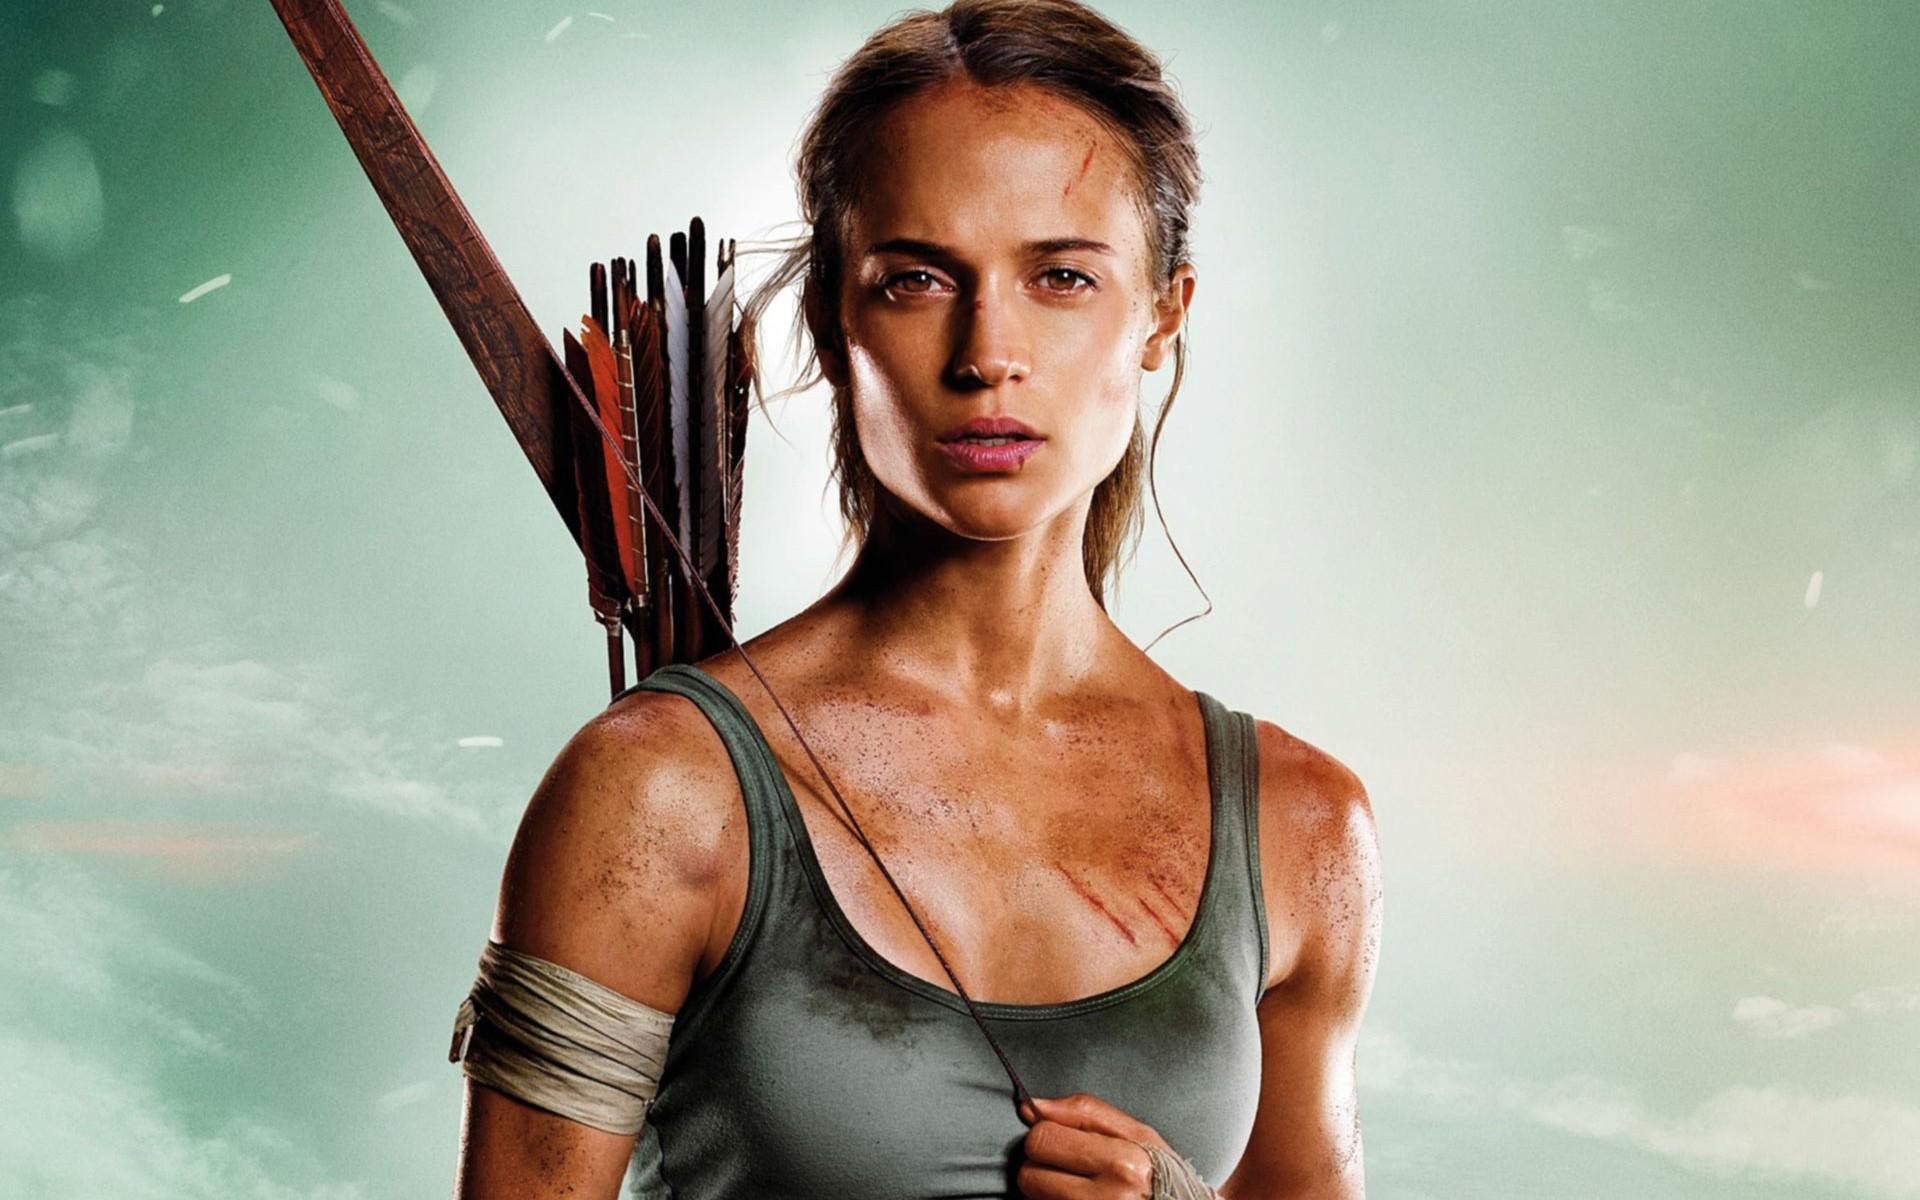 Anime Wallpaper Iphone 7 Plus Tomb Raider Alicia Vikander Lara Croft Wallpapers Hd